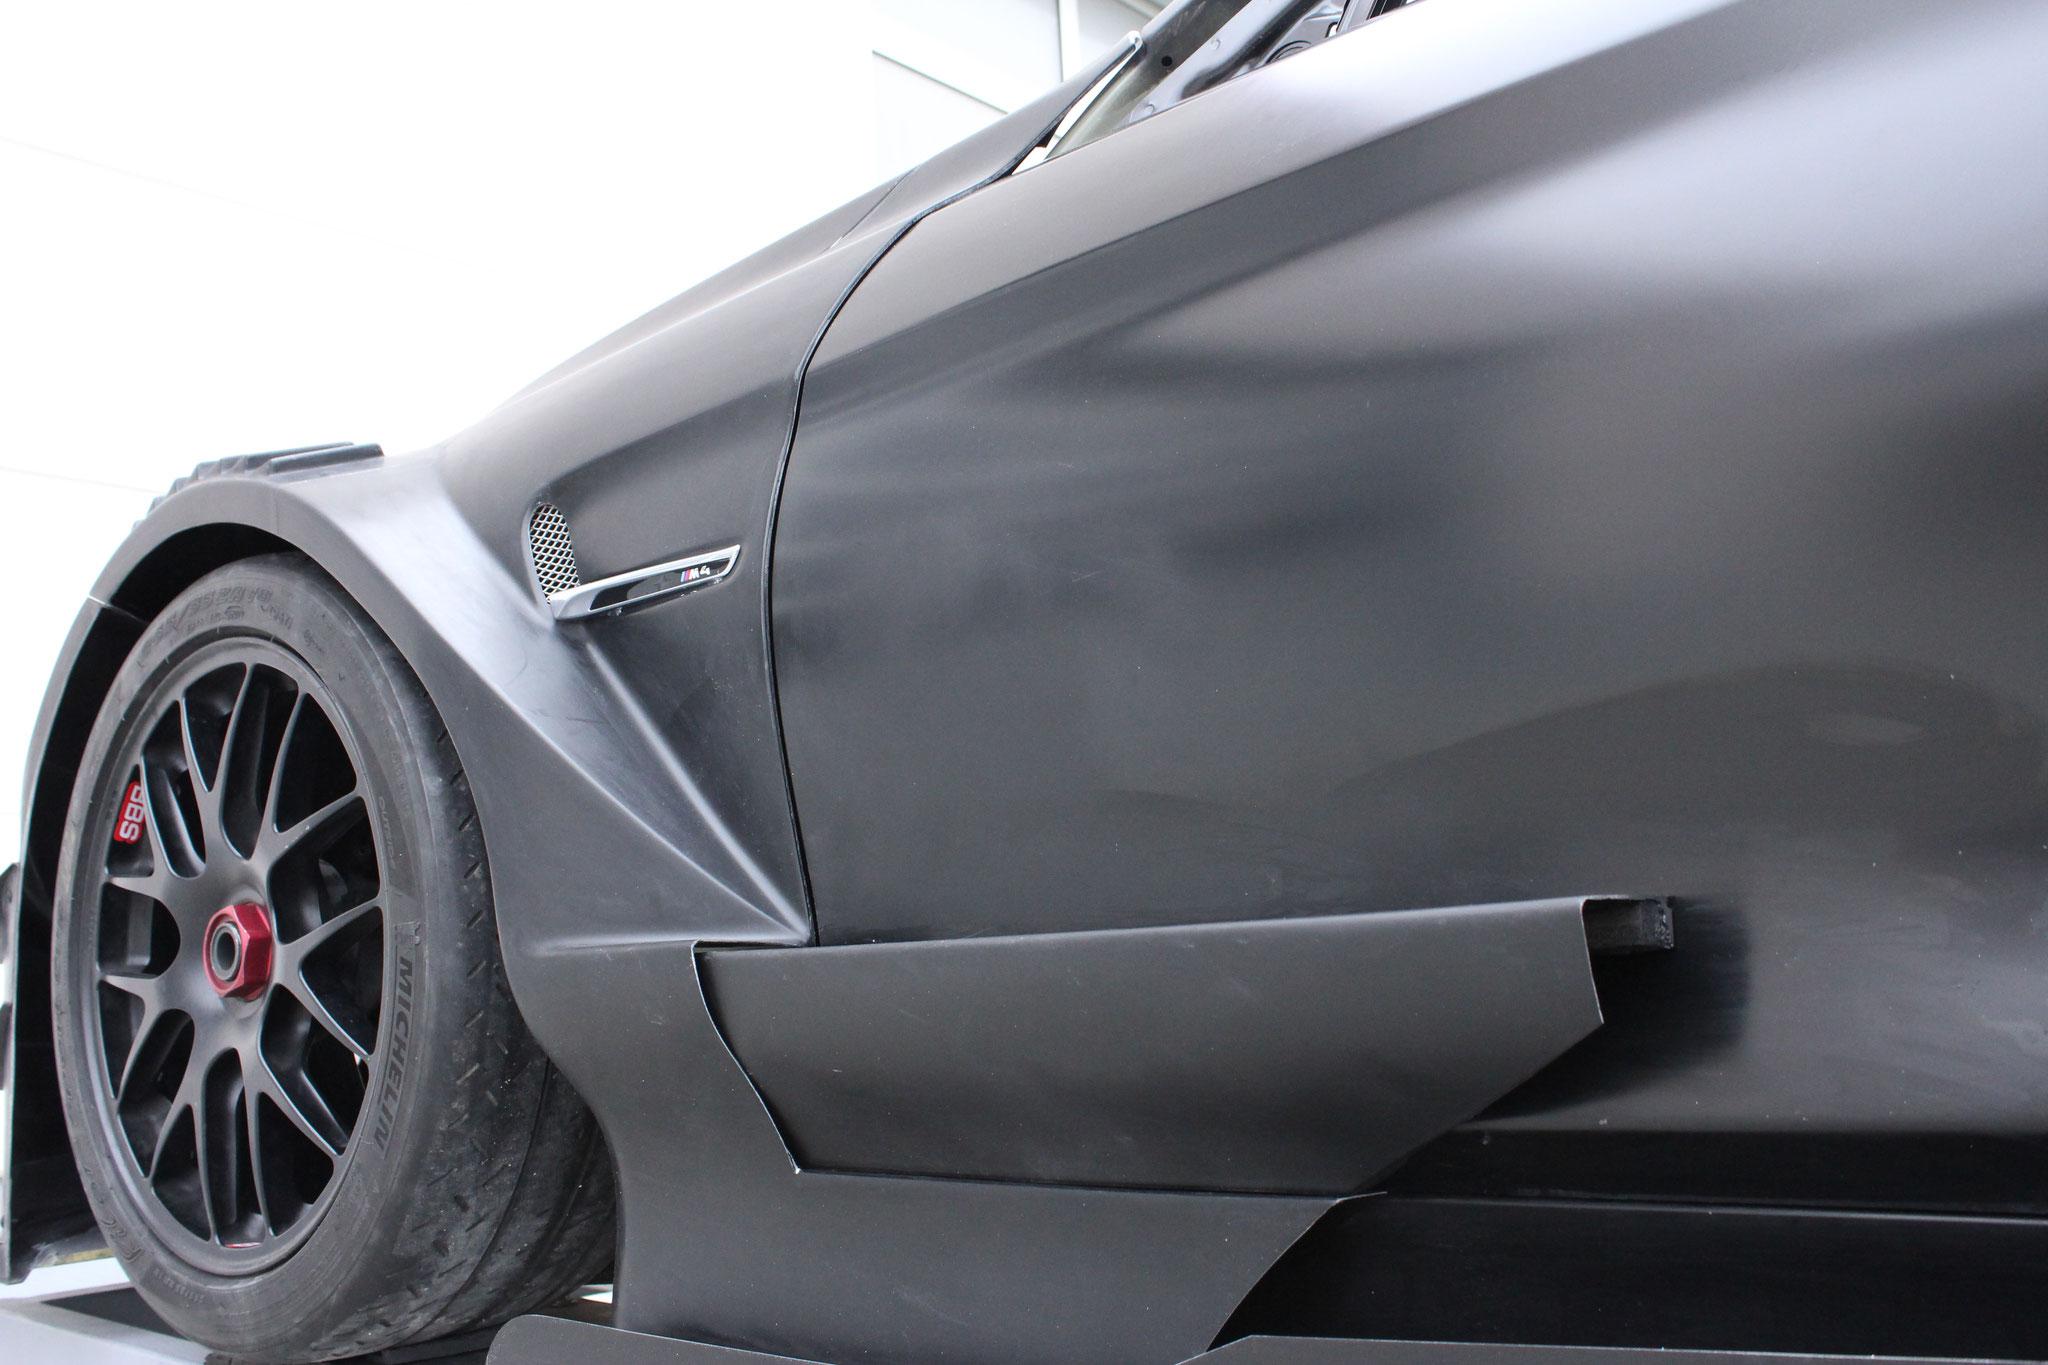 BMW Aero Styling and Body Kits, M2, M4 DTM, Z4 GT3